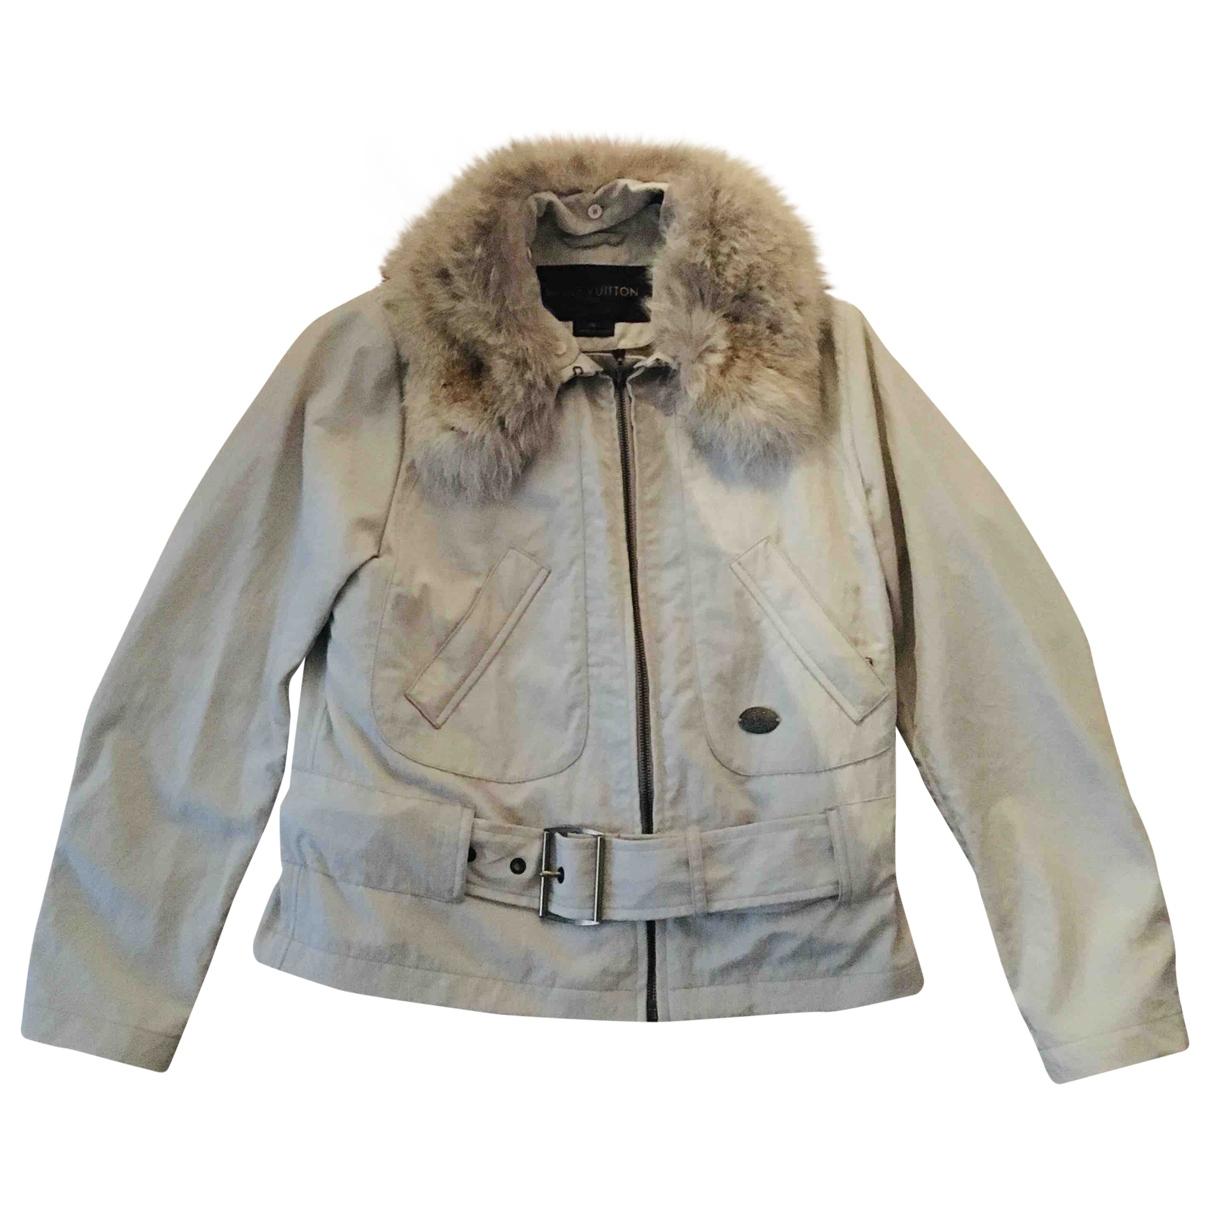 Louis Vuitton \N Beige Leather jacket for Women 36 FR